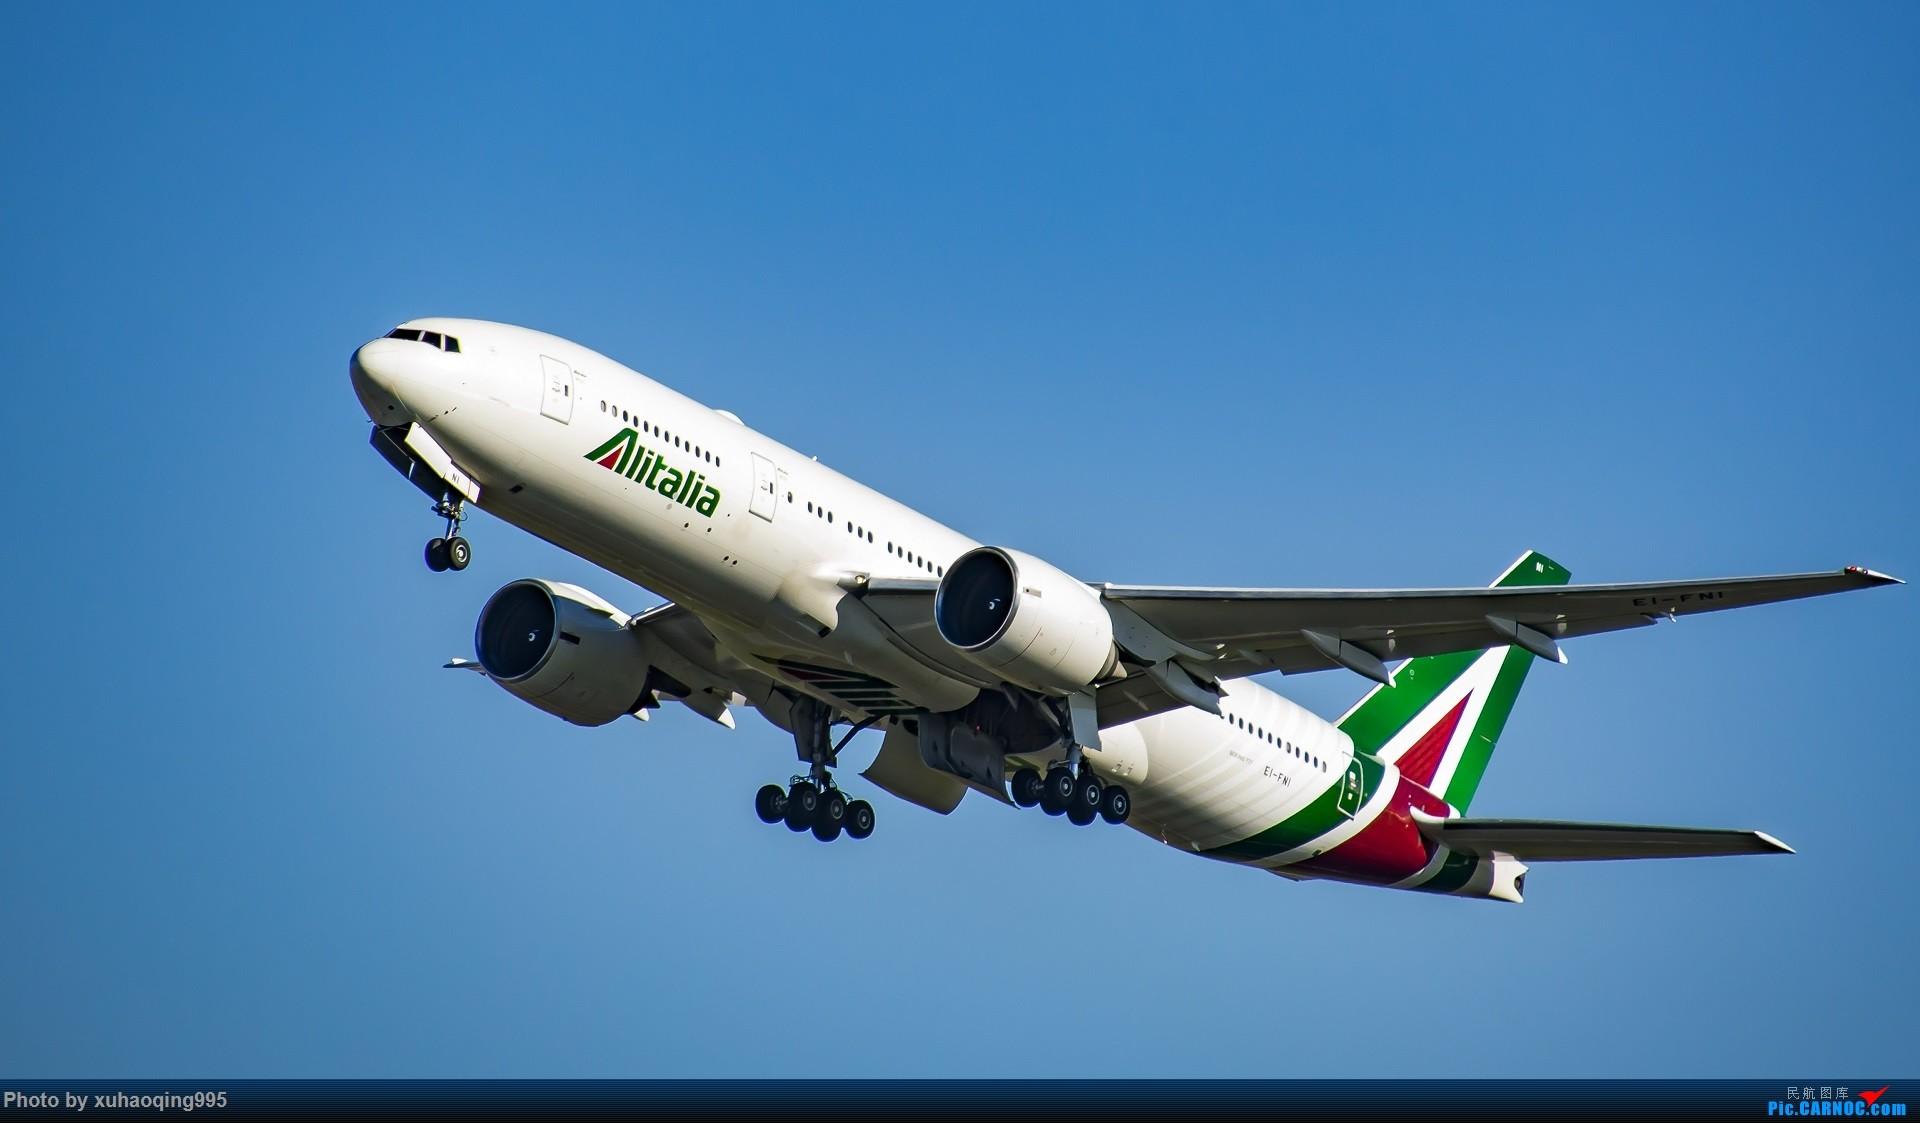 Re:[原创]罗马机场(FCO)拍机 BOEING 777-200 EI-FNI 意大利菲乌米奇诺机场